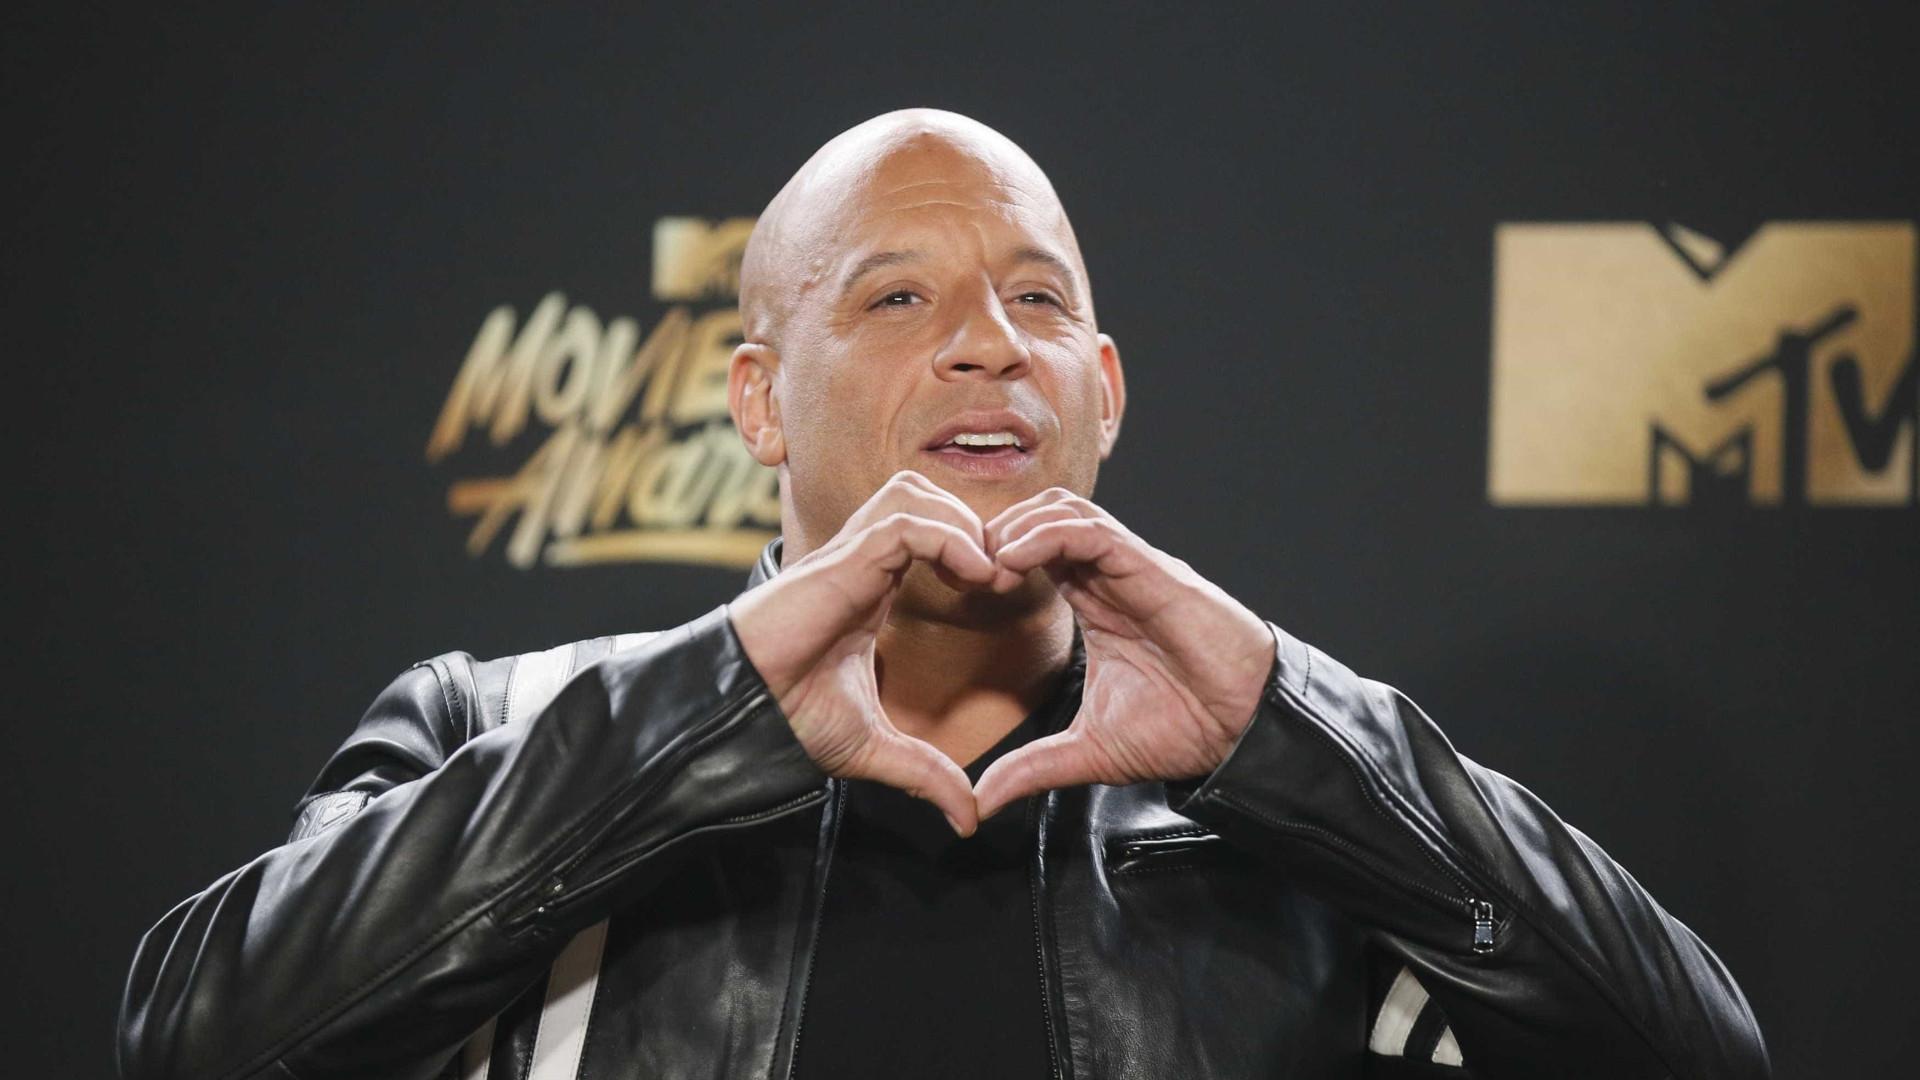 A pedidos, Vin Diesel anuncia versão feminina de 'Velozes e Furiosos'